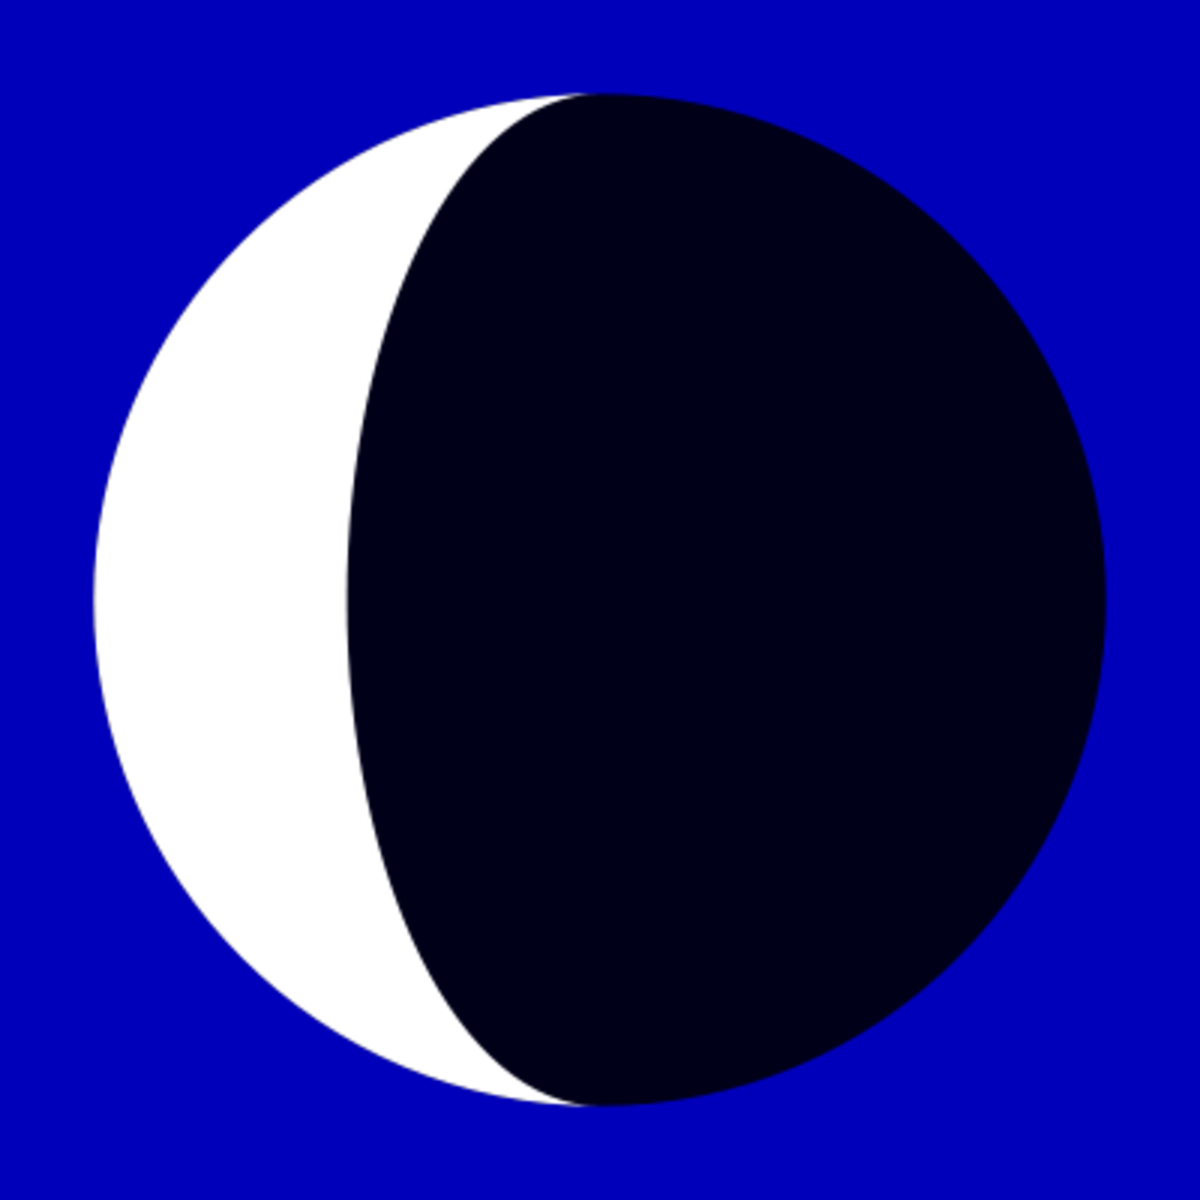 Born Under a Waning Crescent / Balsamic Moon